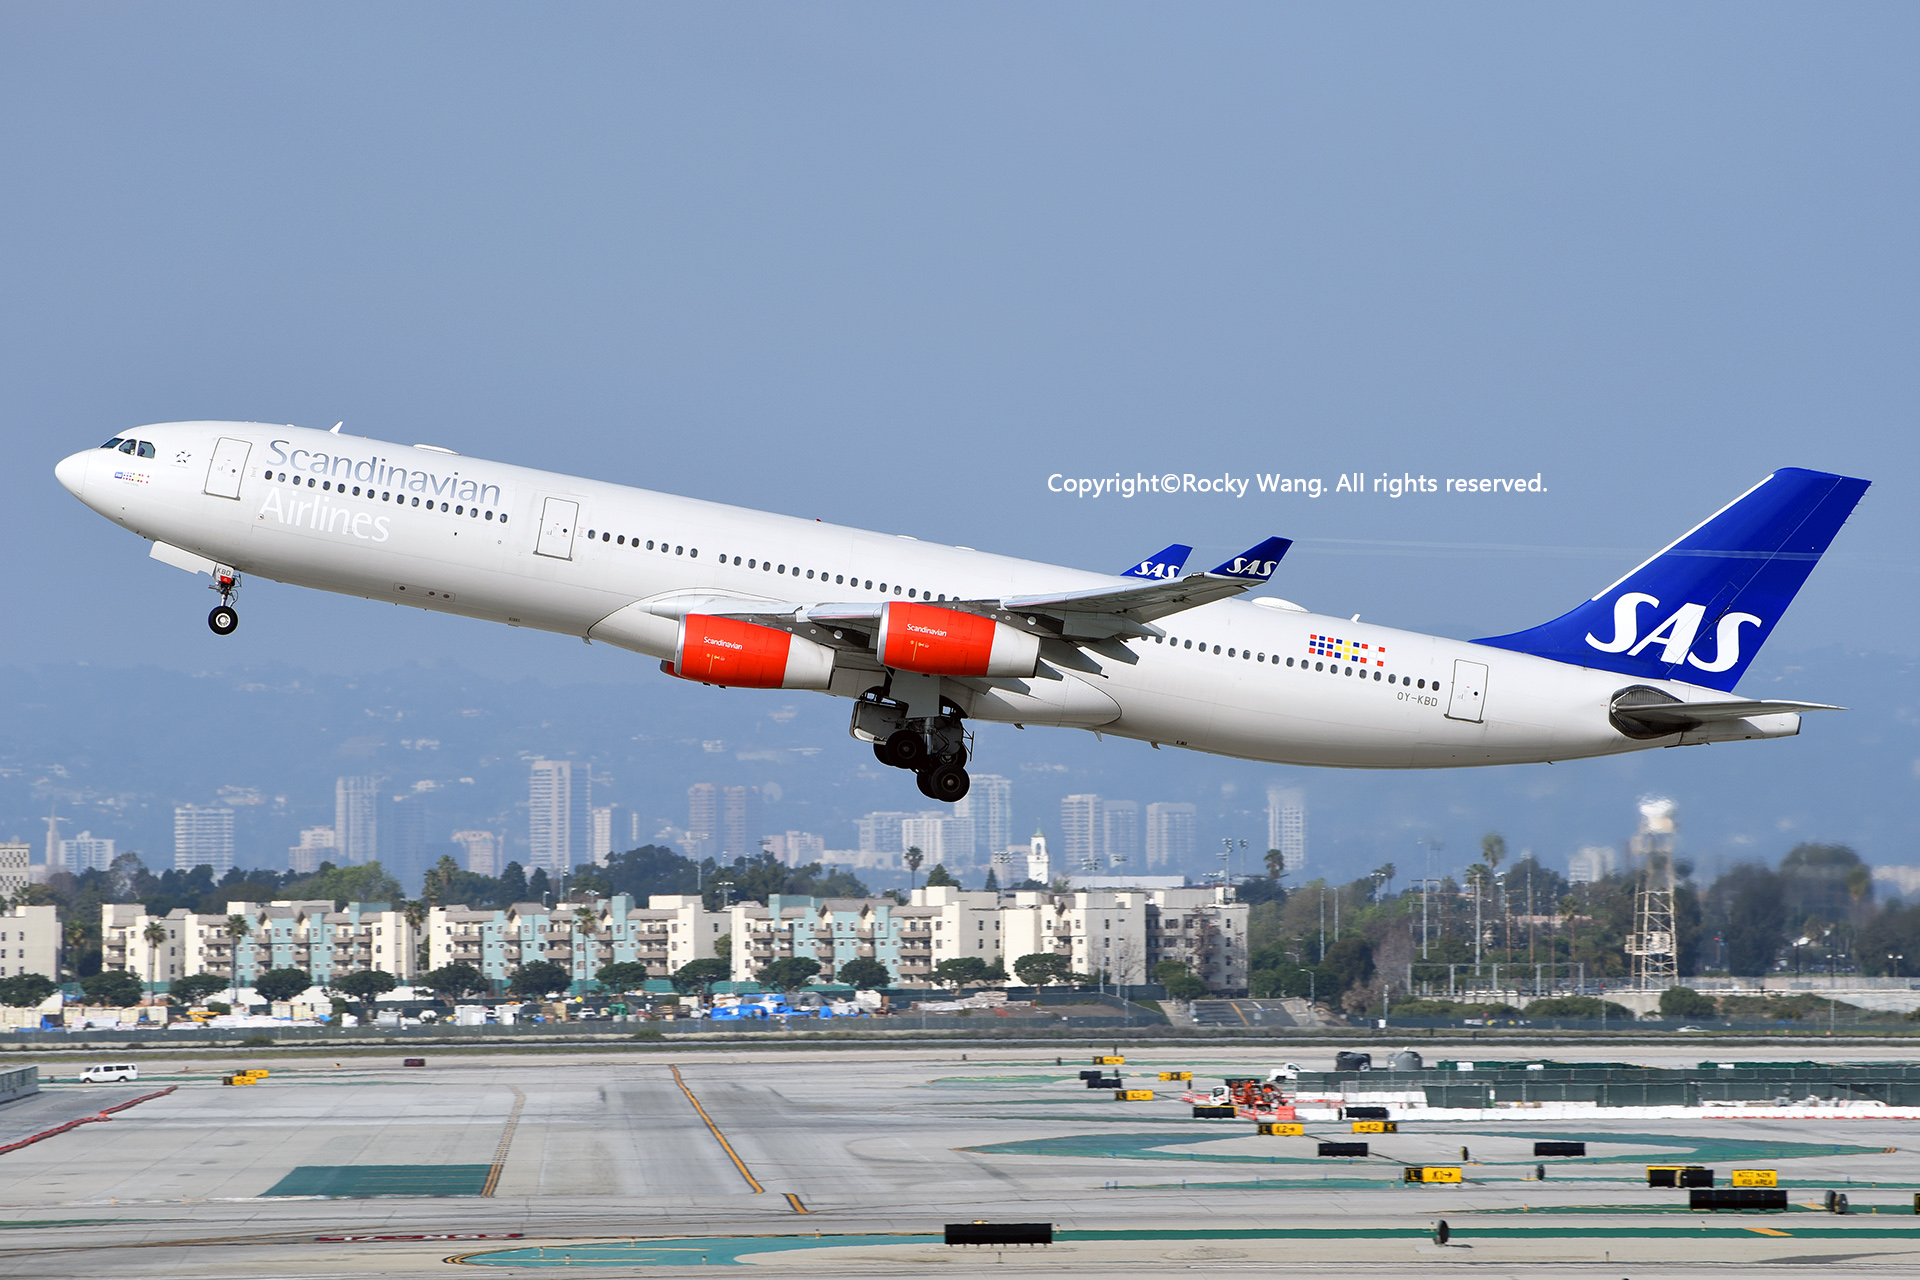 Re:[原创]随便来一组 不凑30图了 AIRBUS A340-313X OY-KBD Los Angeles Int'l Airport